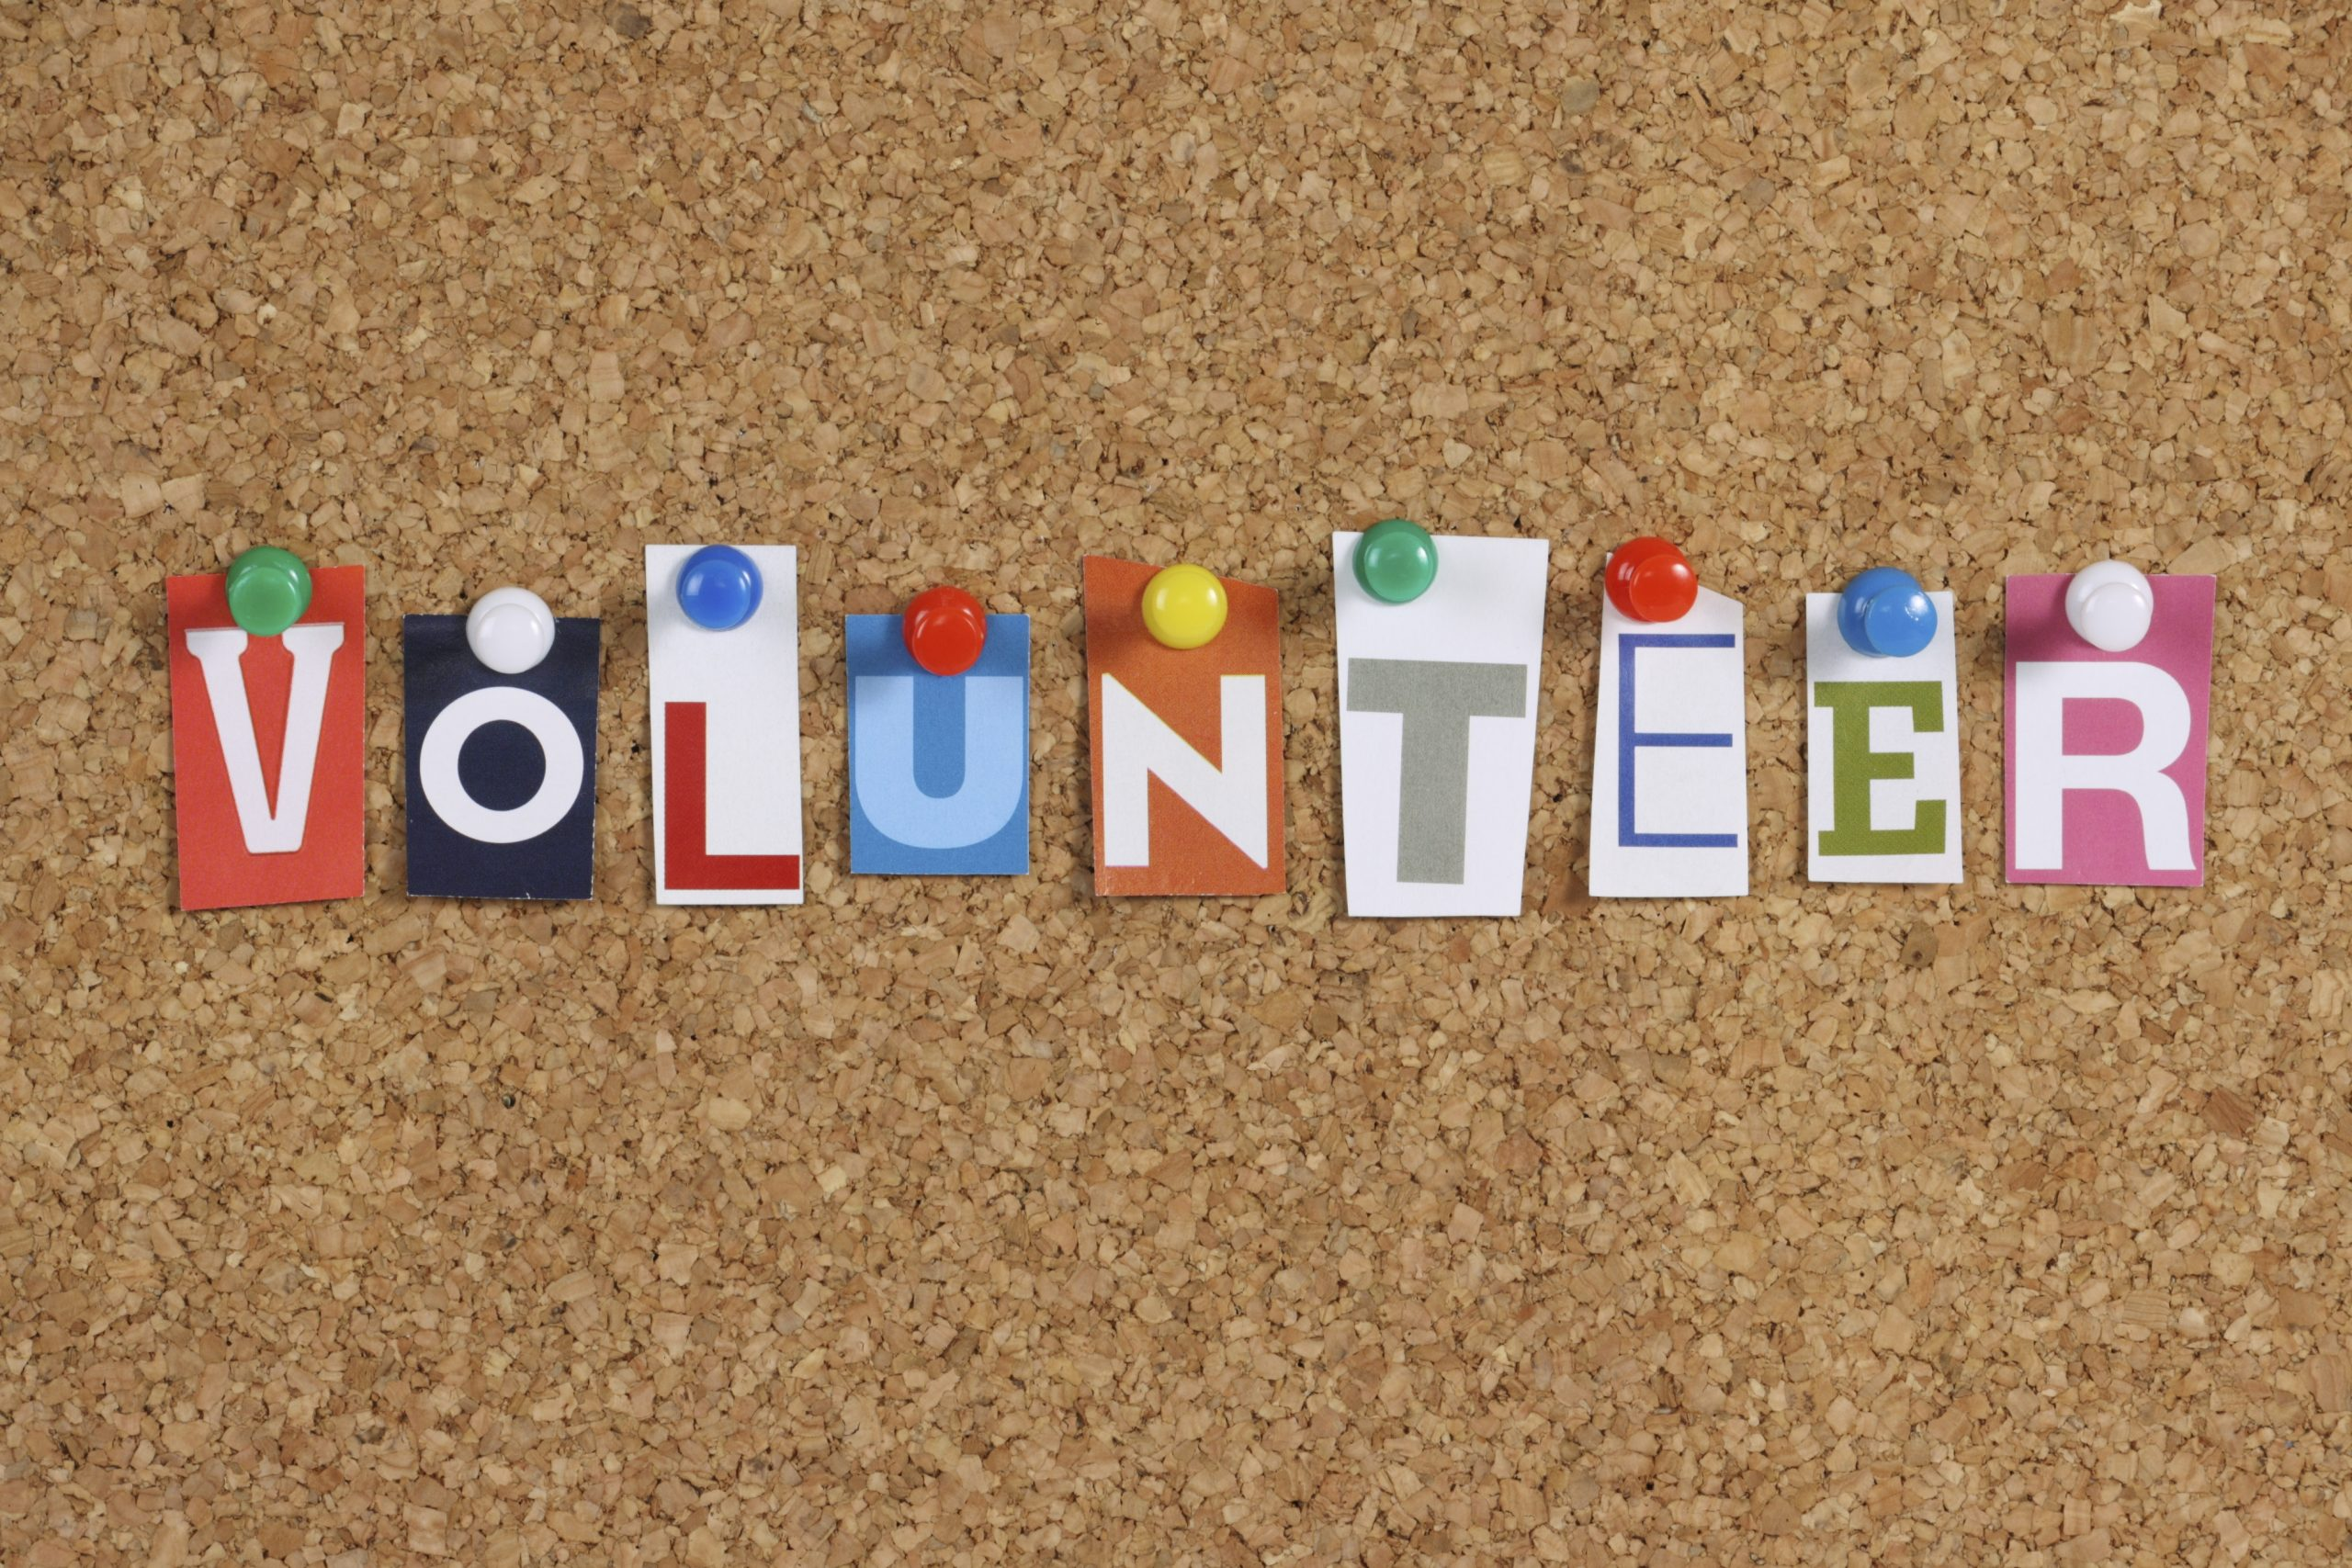 Volunteer for a SPIRIT 105.3 Event